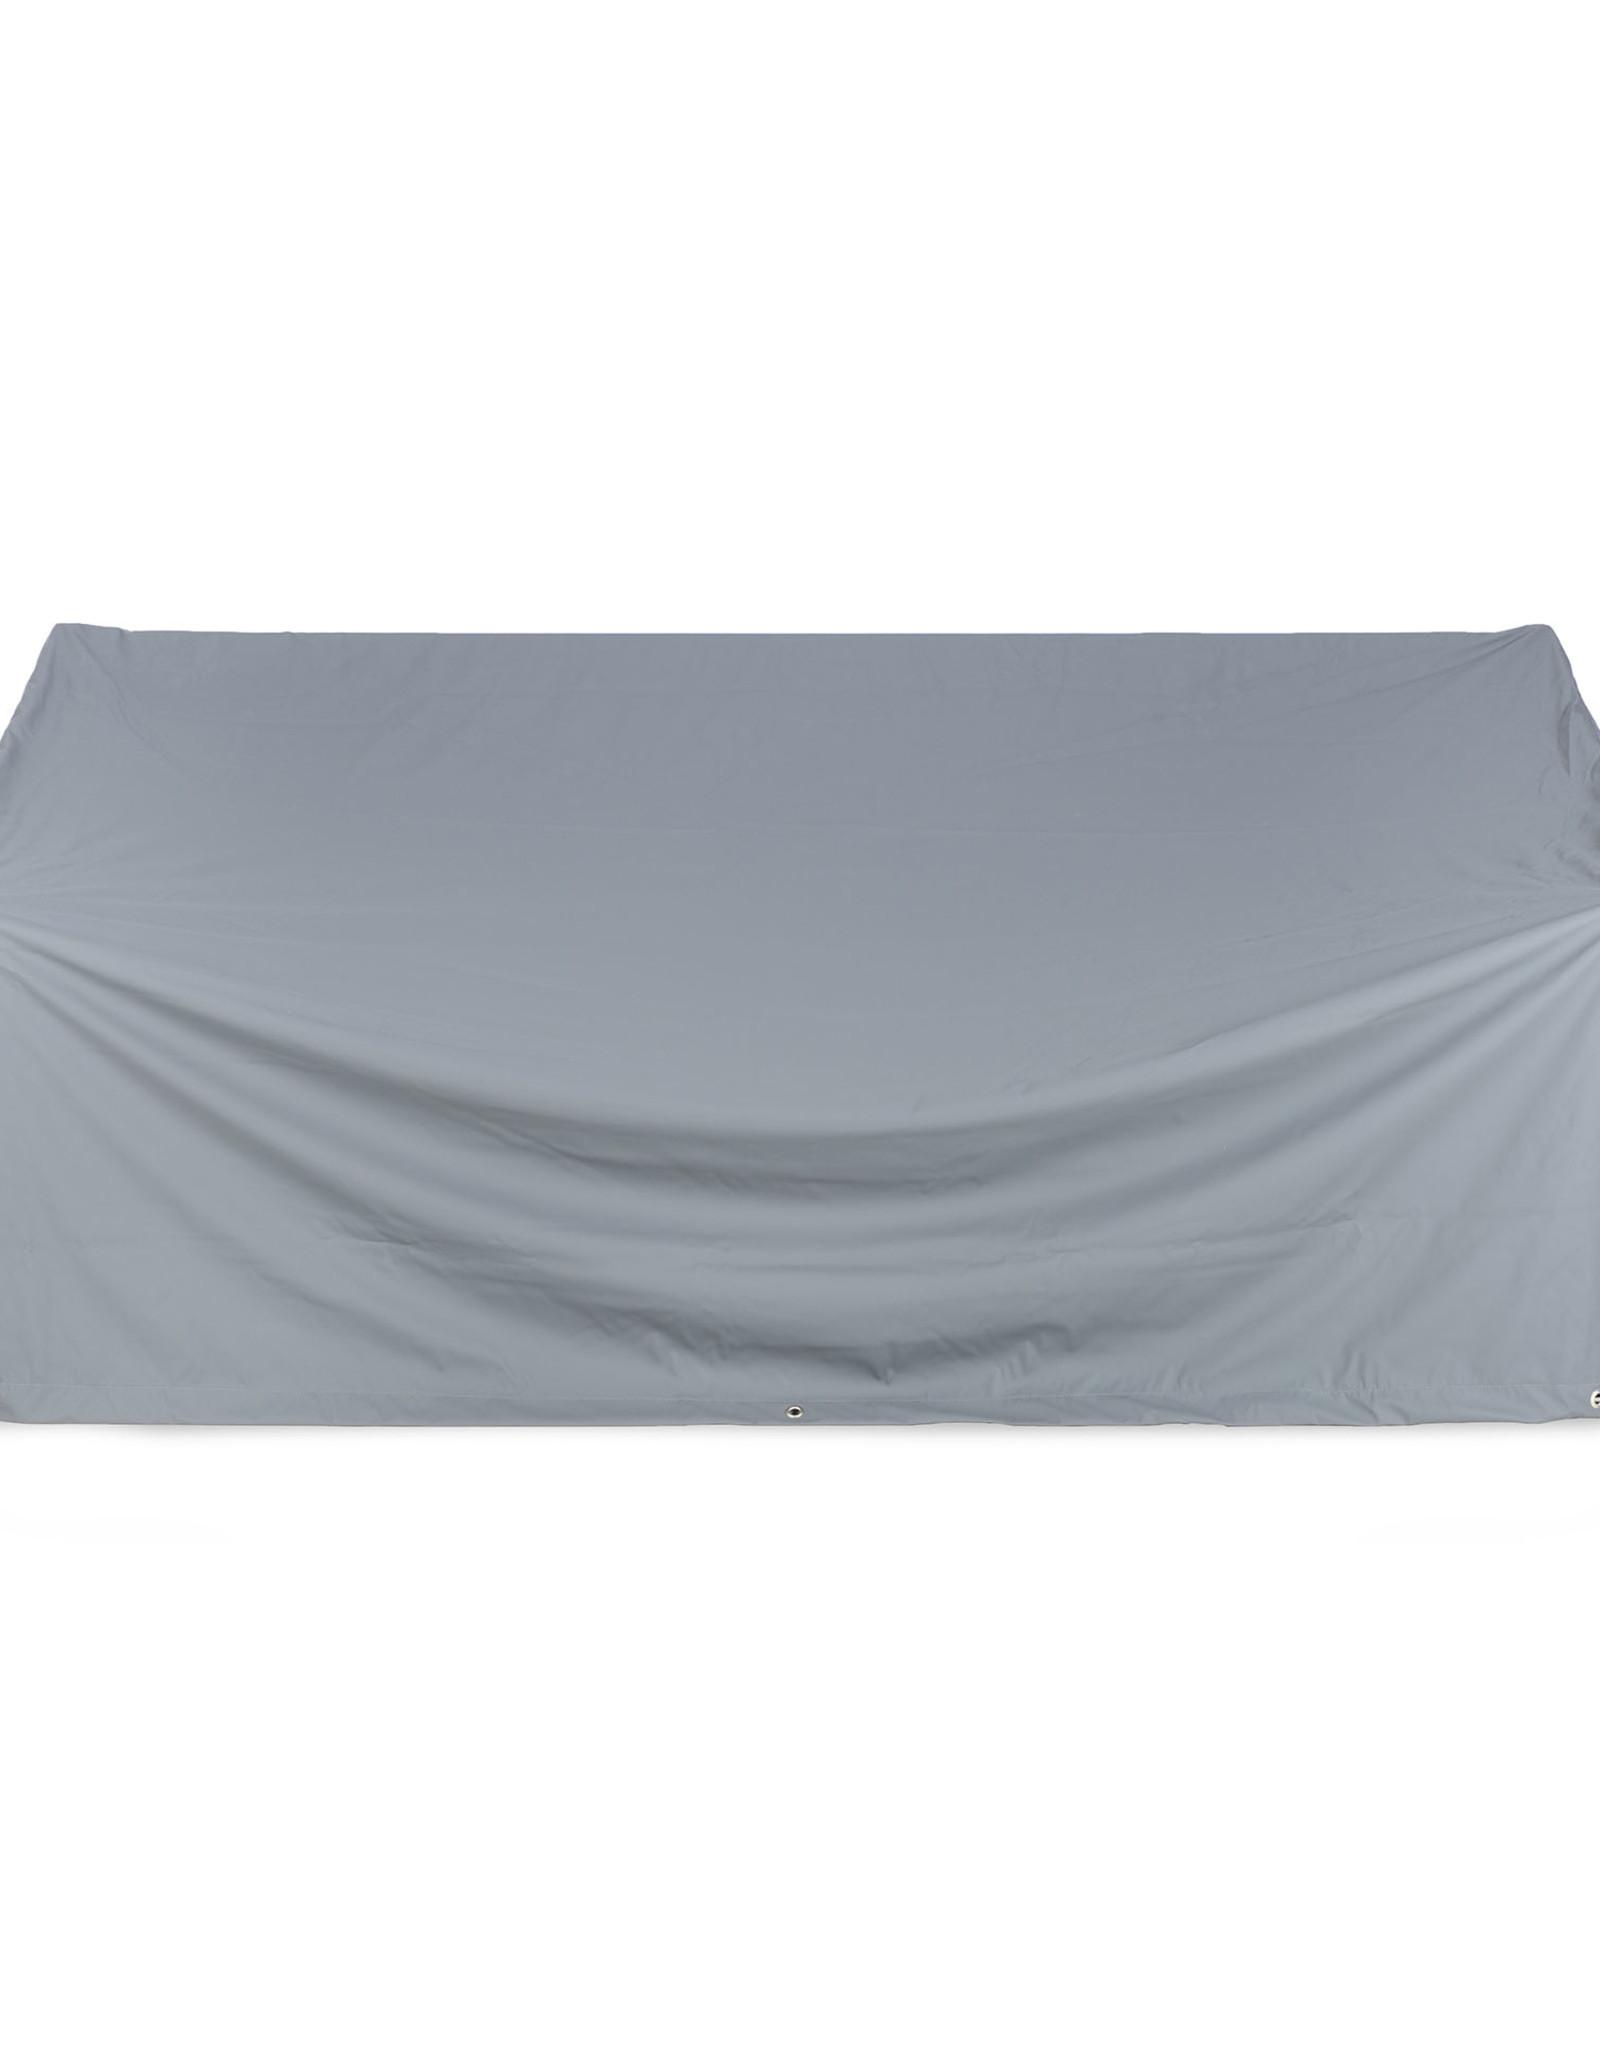 Raincover Jack outdoor sofa, 71 x 35 x 30